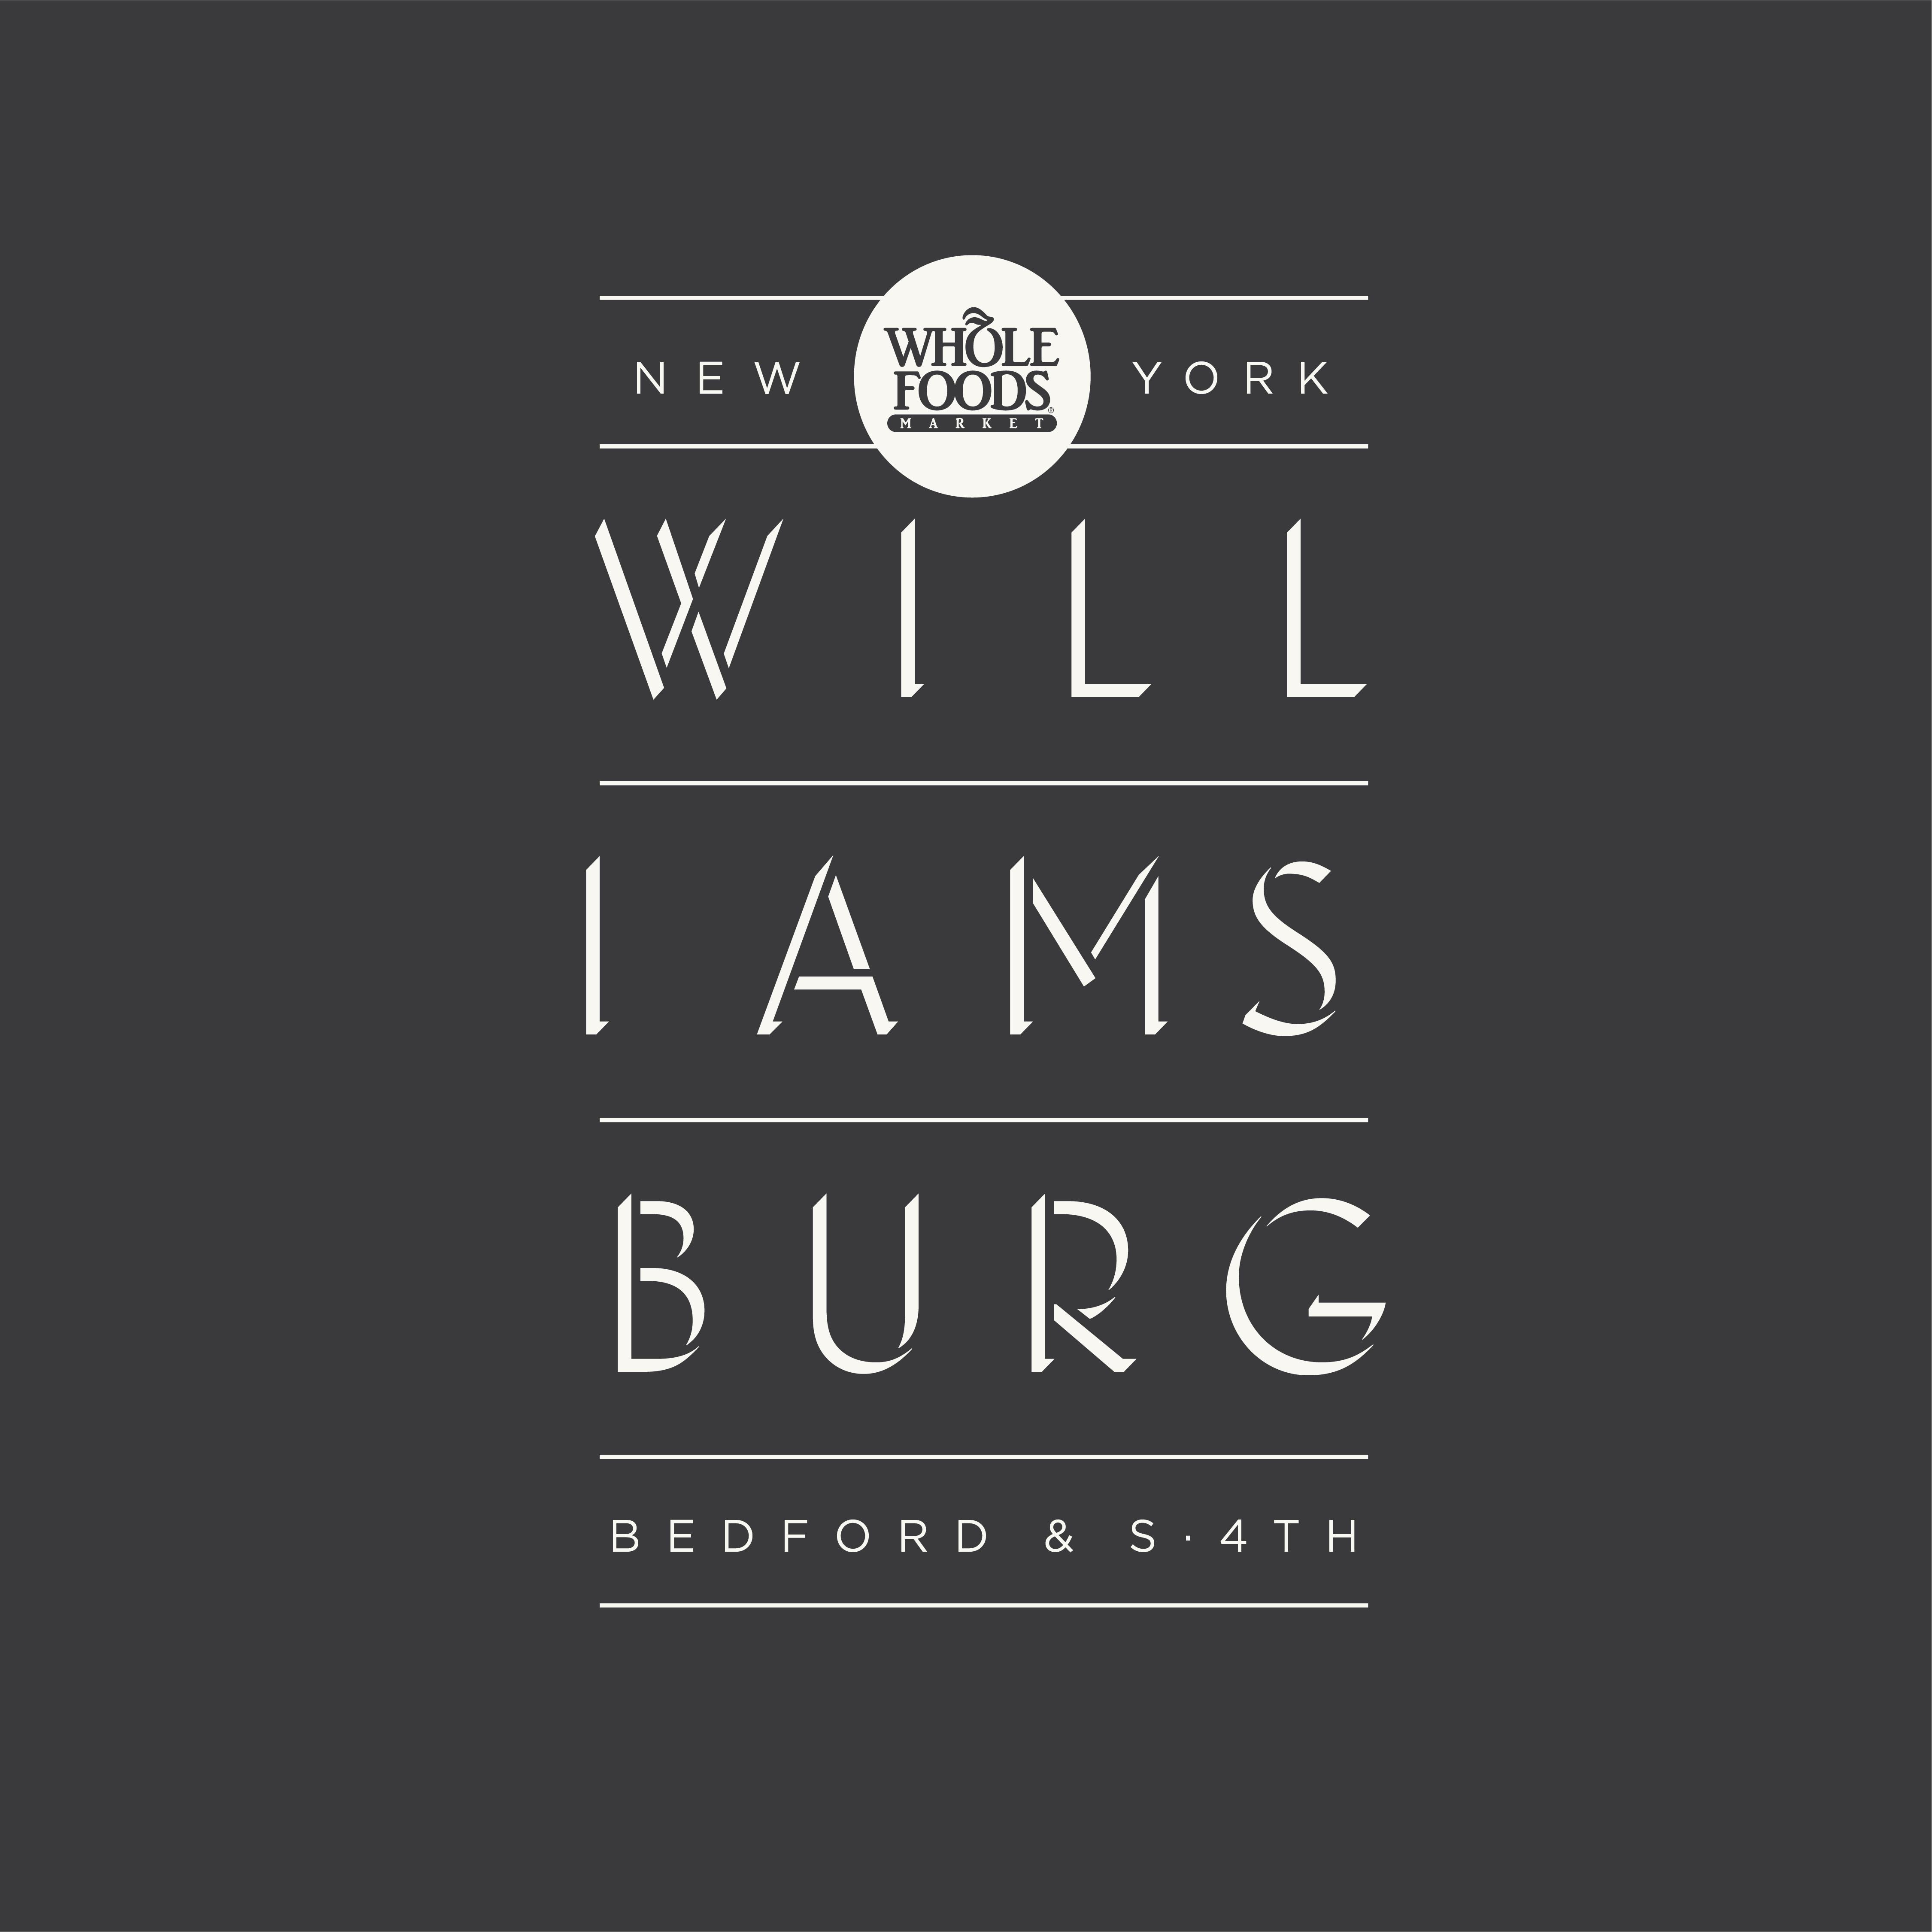 Whole Foods Market Williamsburg Logo Design Graphic Design Projects Graphic Design